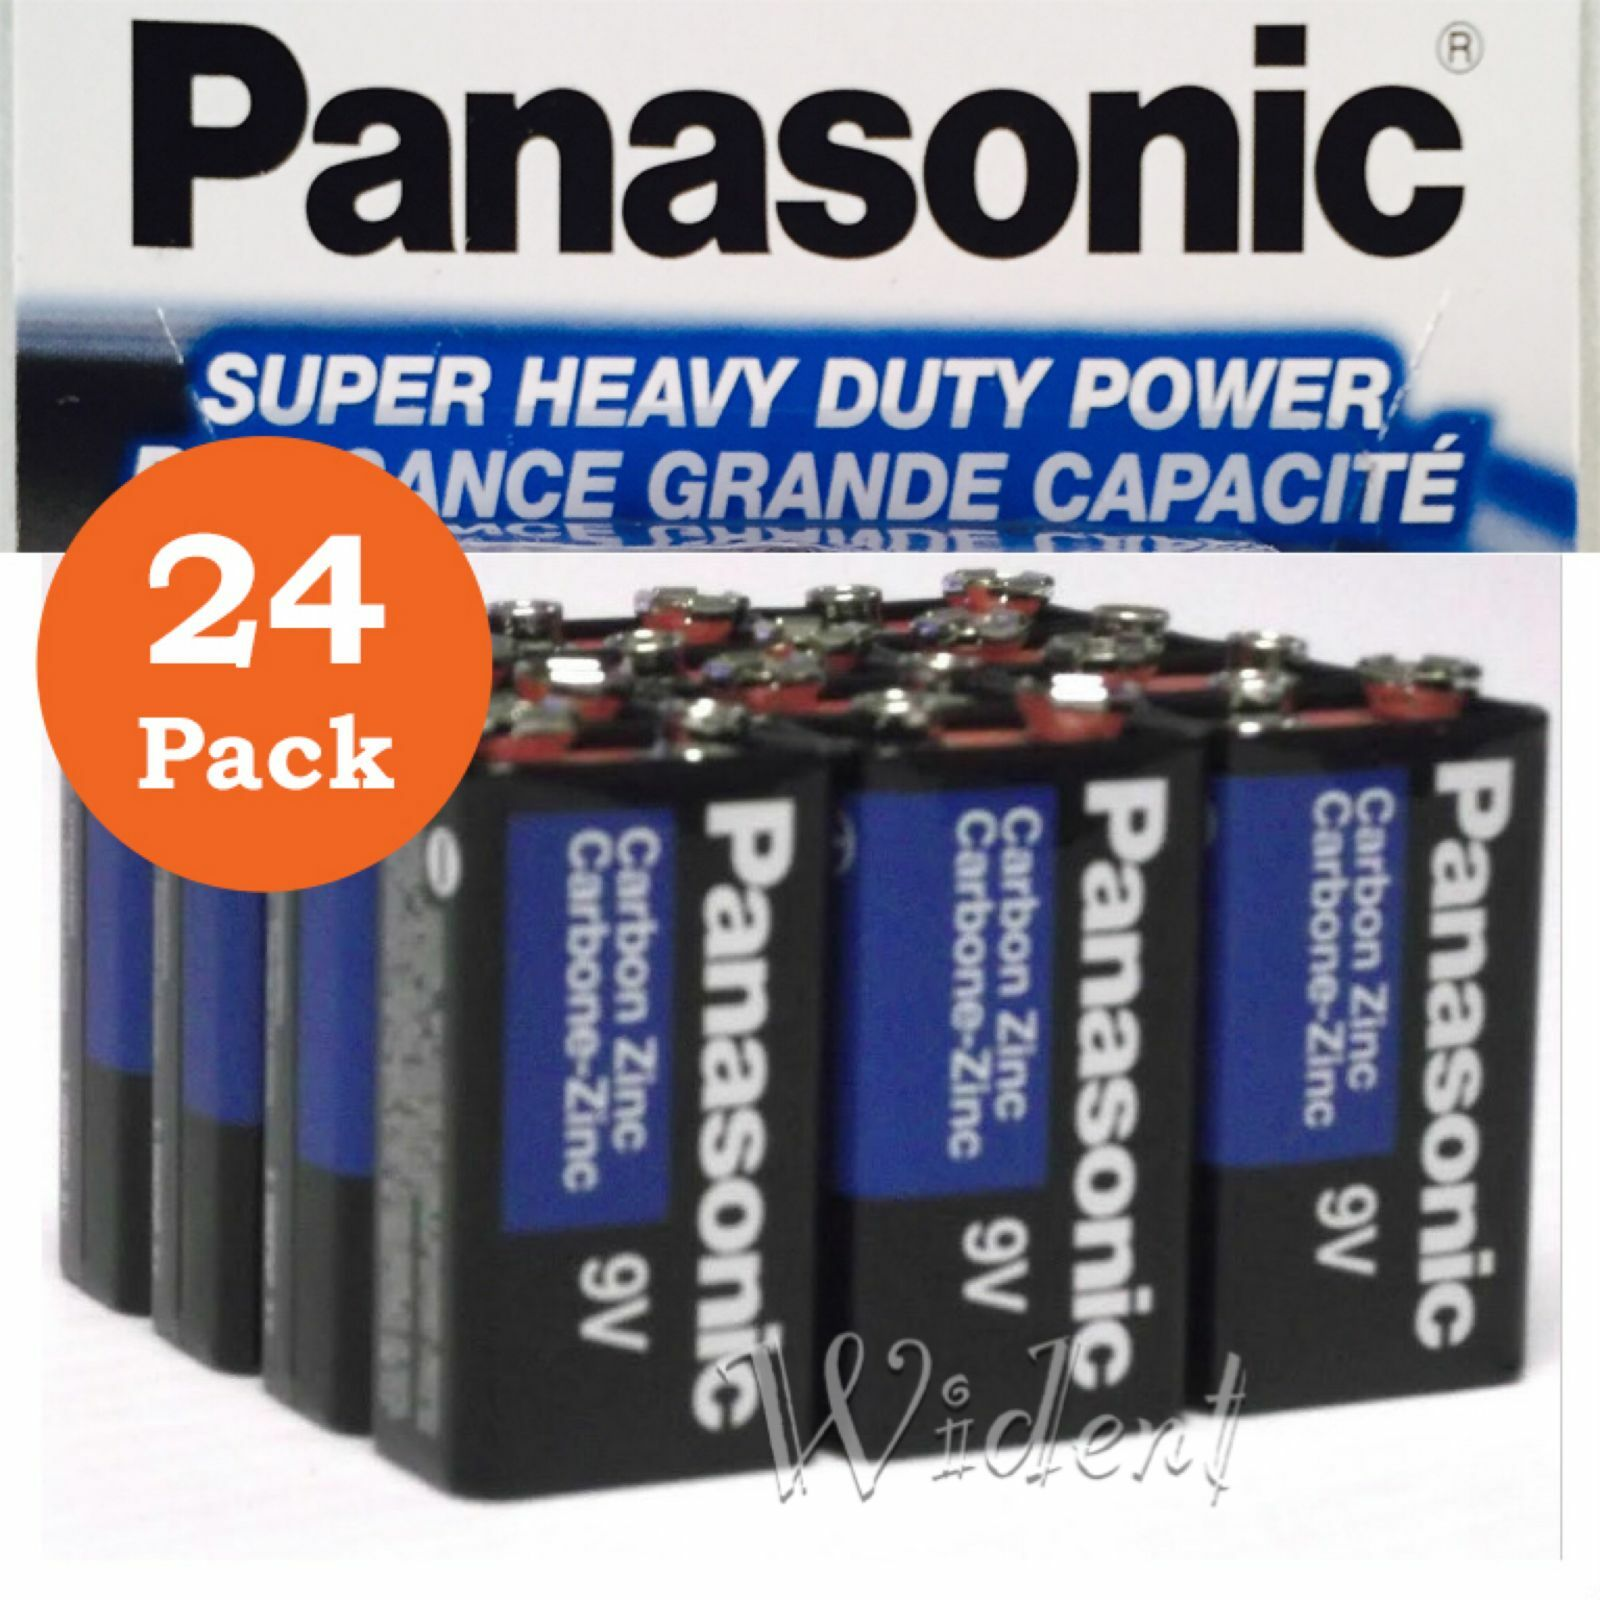 24Pk Panasonic Battery Batteries 9V Super Heavy Duty Power Zinc Carbon